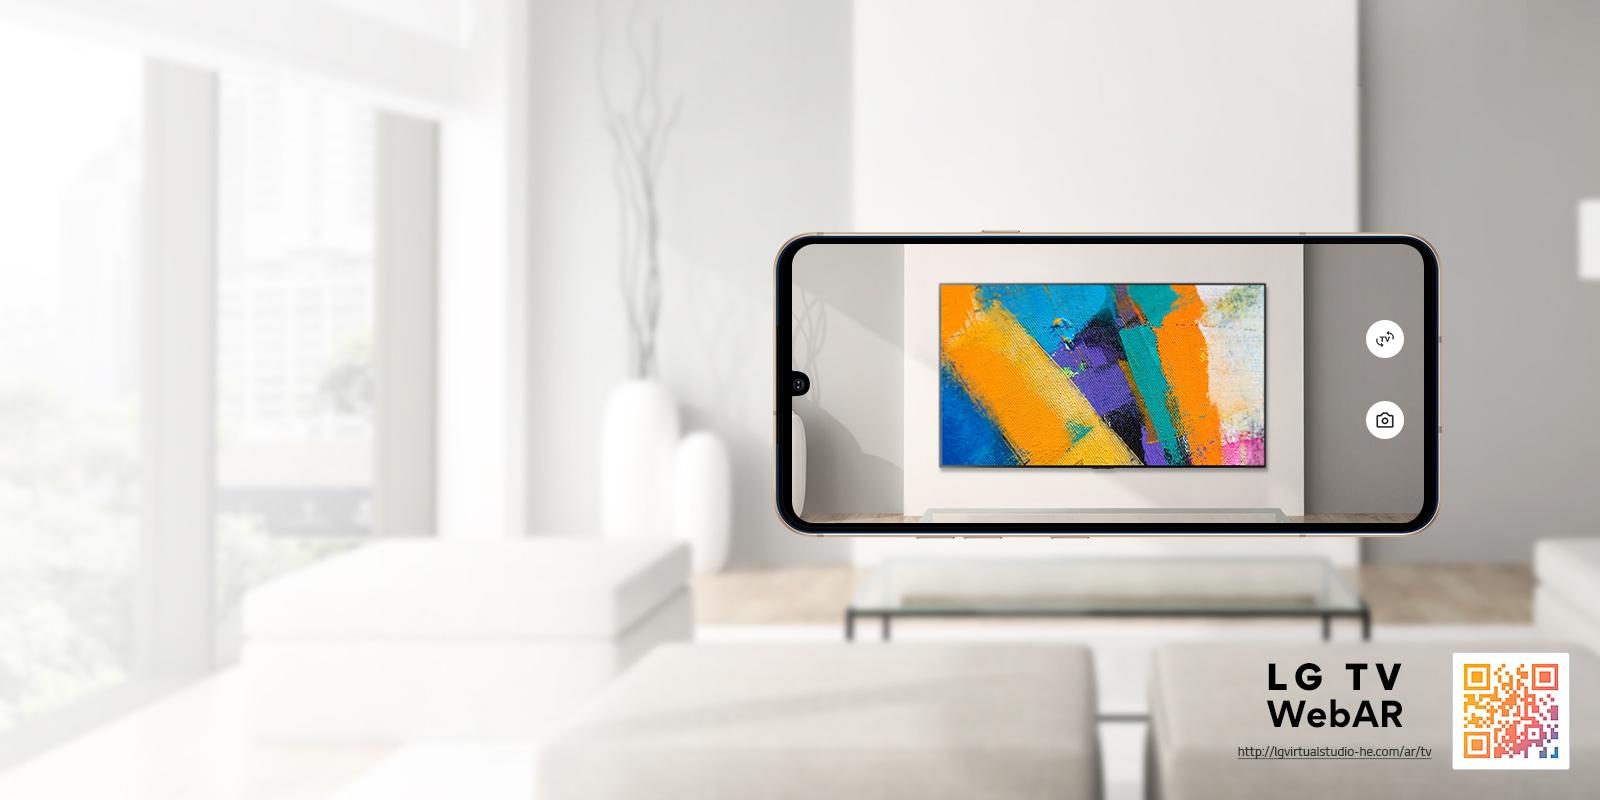 Ini merupakan simulasi gambar Web AR dari OLED TV LG. Gambar smartphone terlihat overlap pada ruang minimalis. Terdapat QR code pada bagian kanan bawah